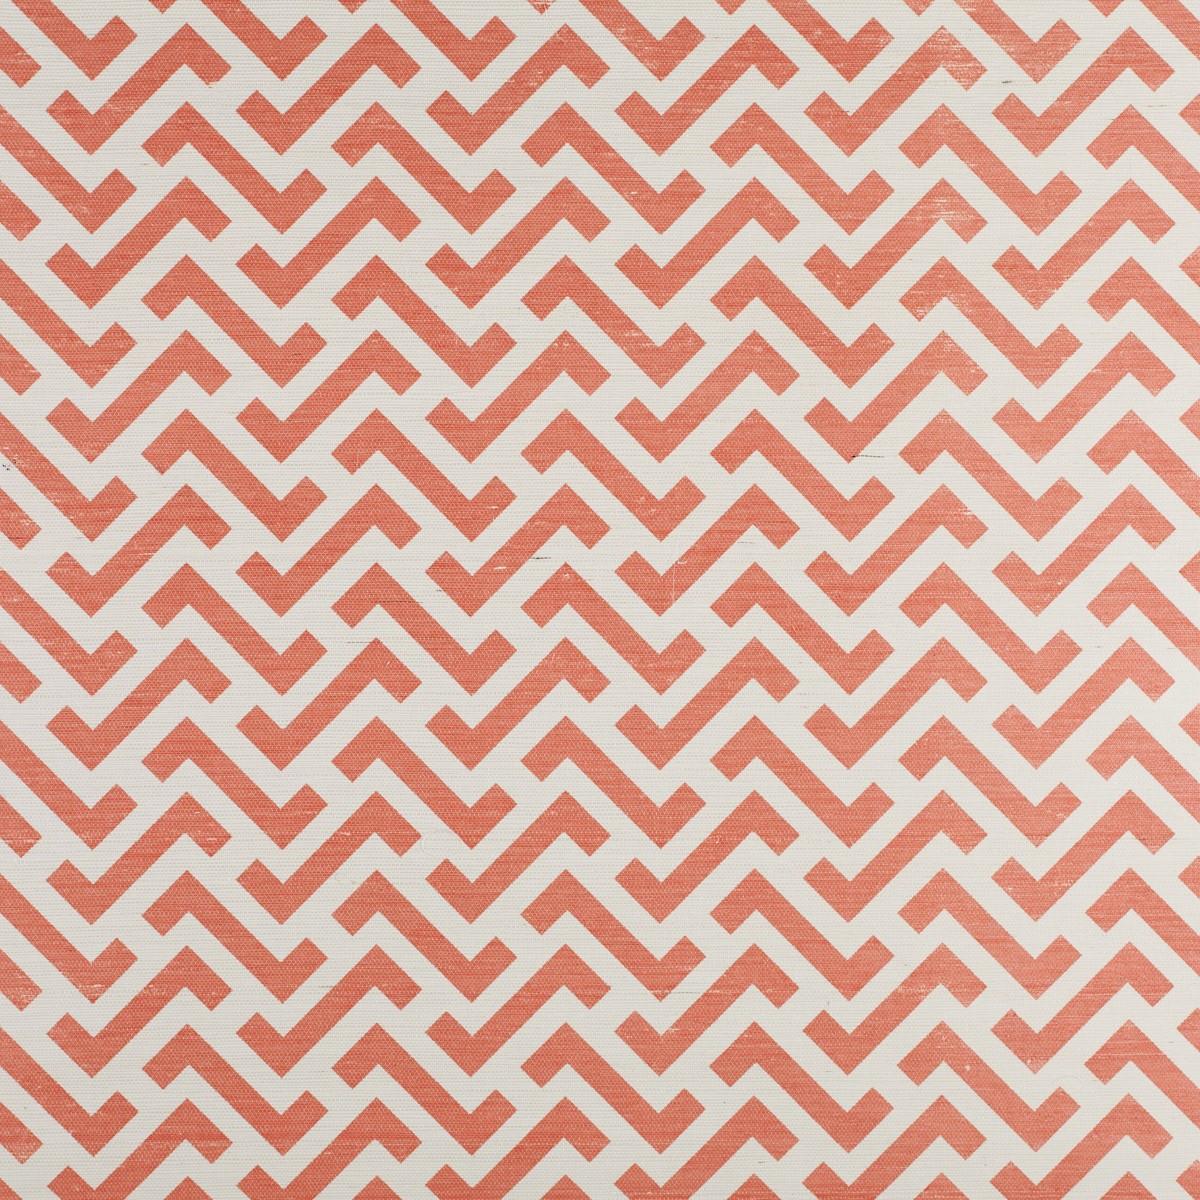 pin babies wallpaper zig zag wallpapers 2 on pinterest